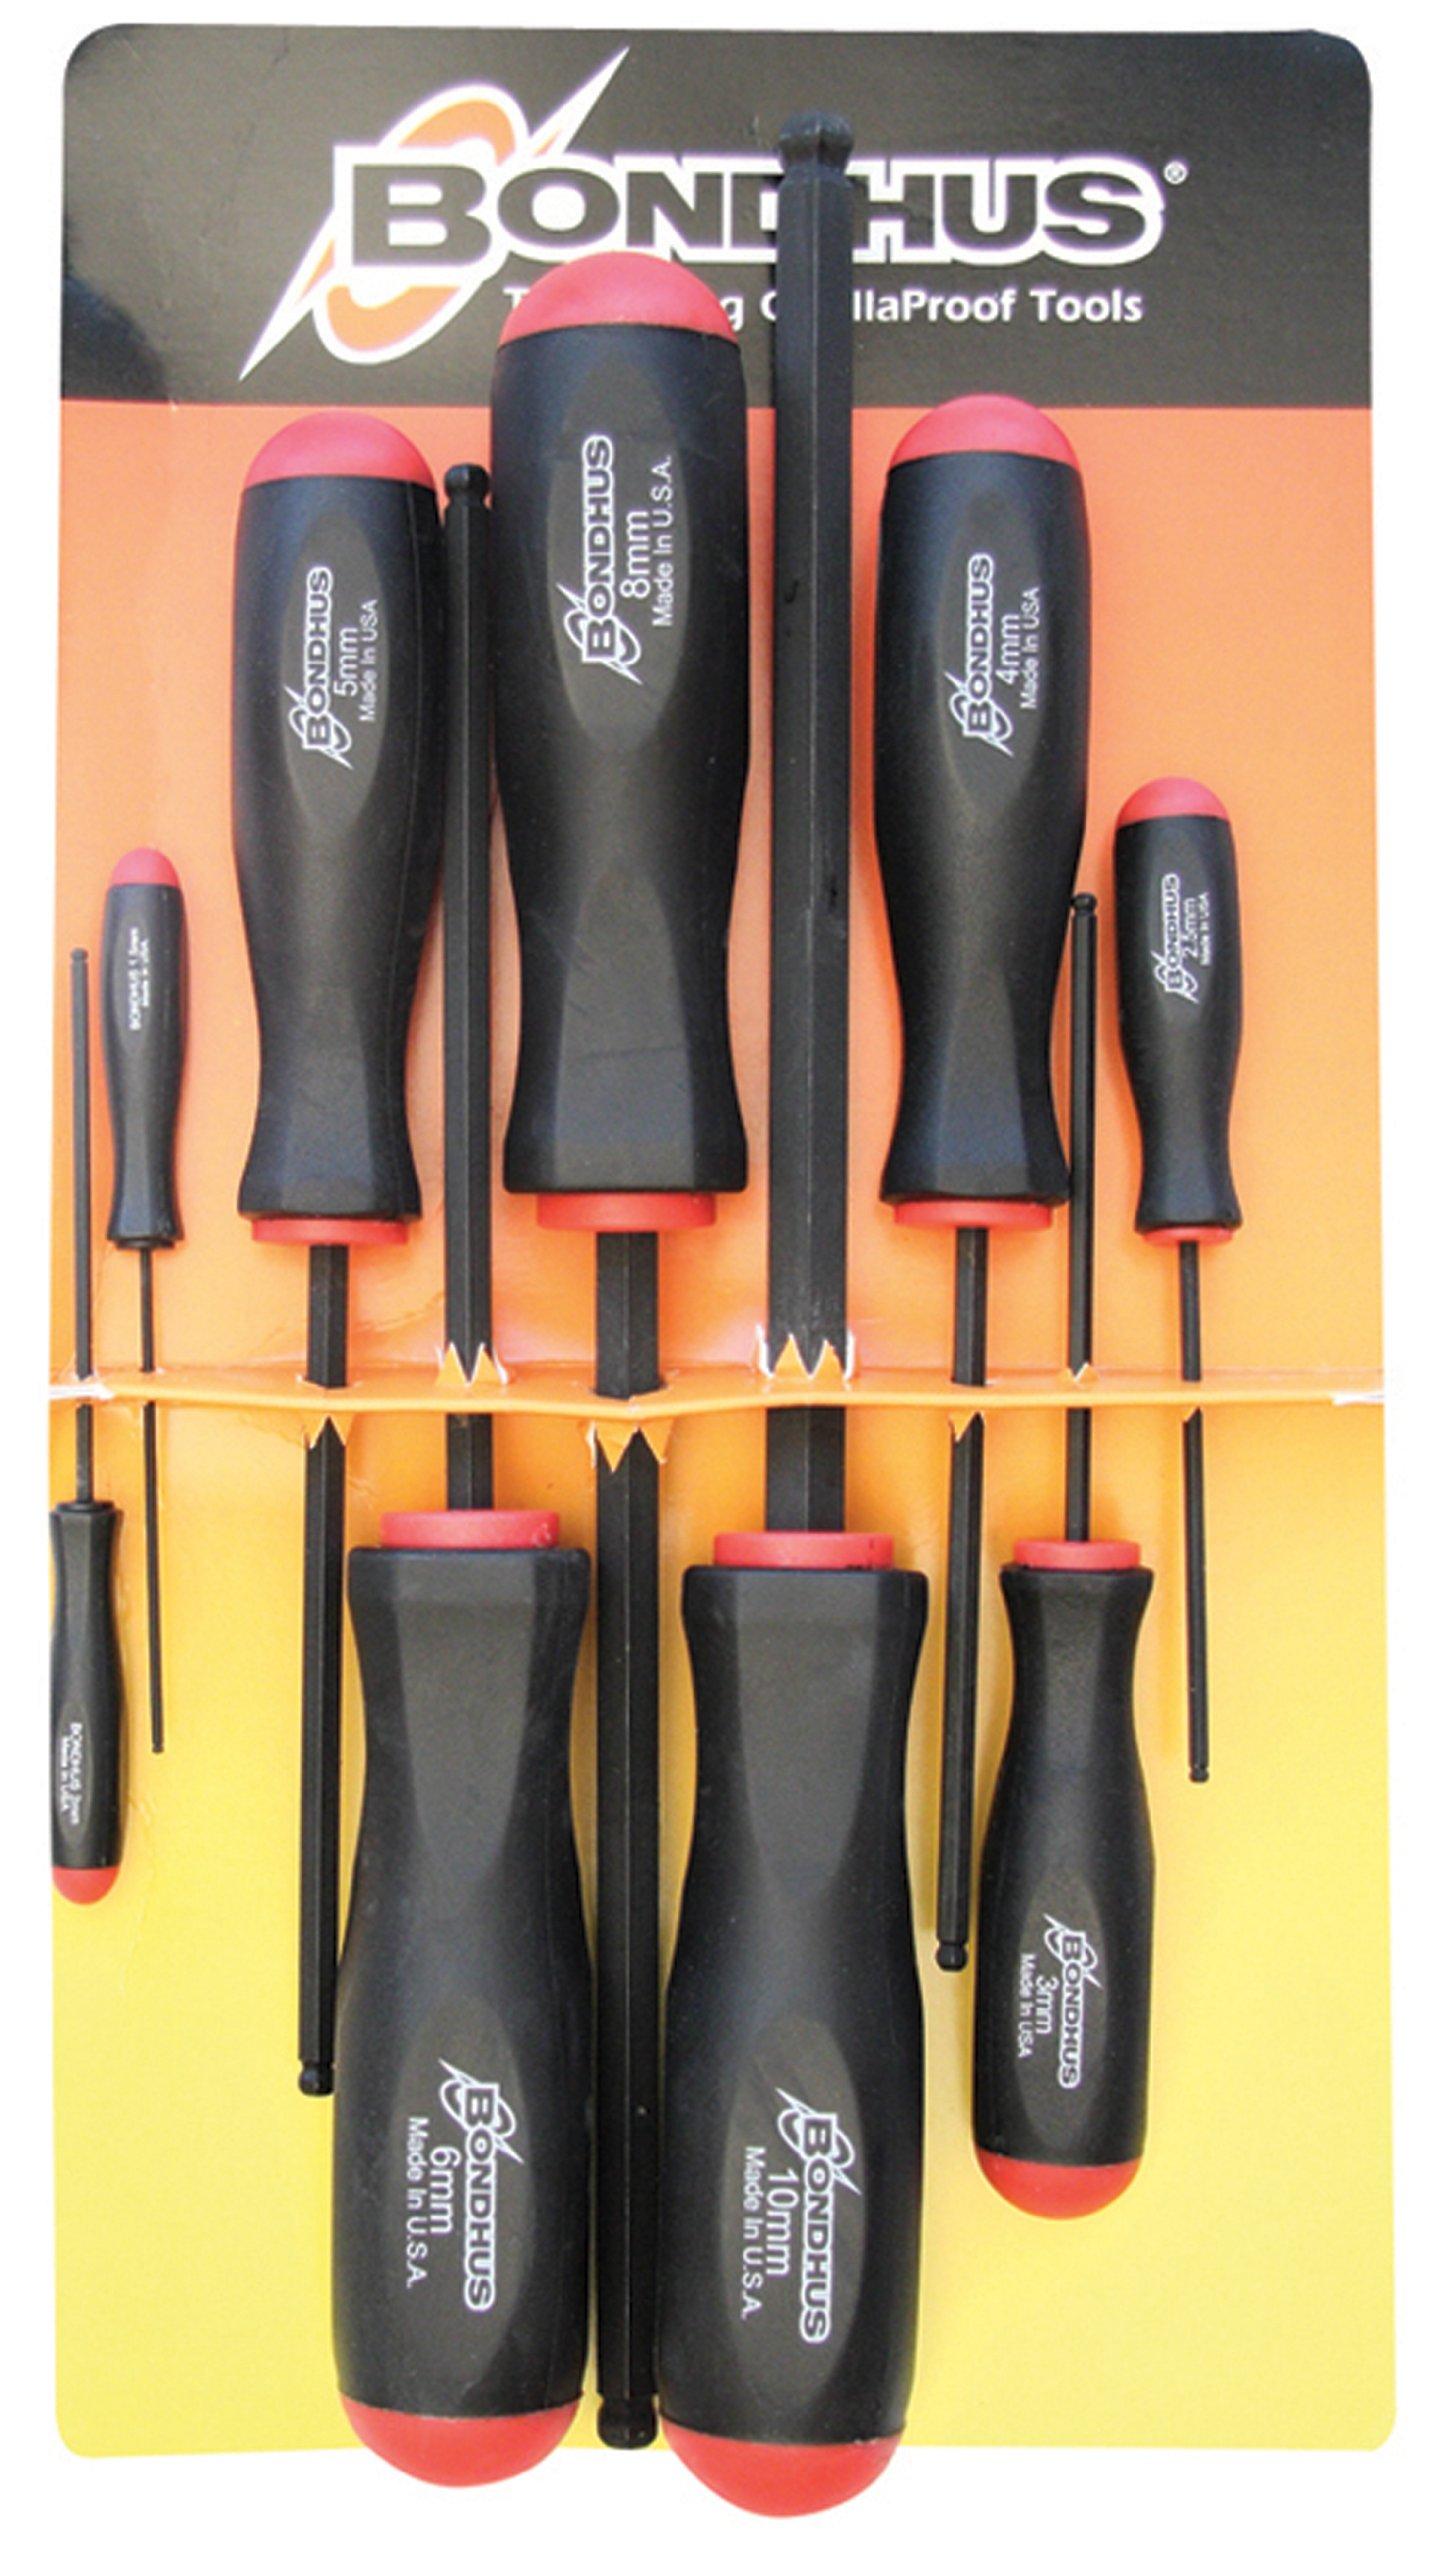 Bondhus 10699 Set of 9 Balldriver Screwdrivers, ProGuard Finish, sizes 1.5-10mm